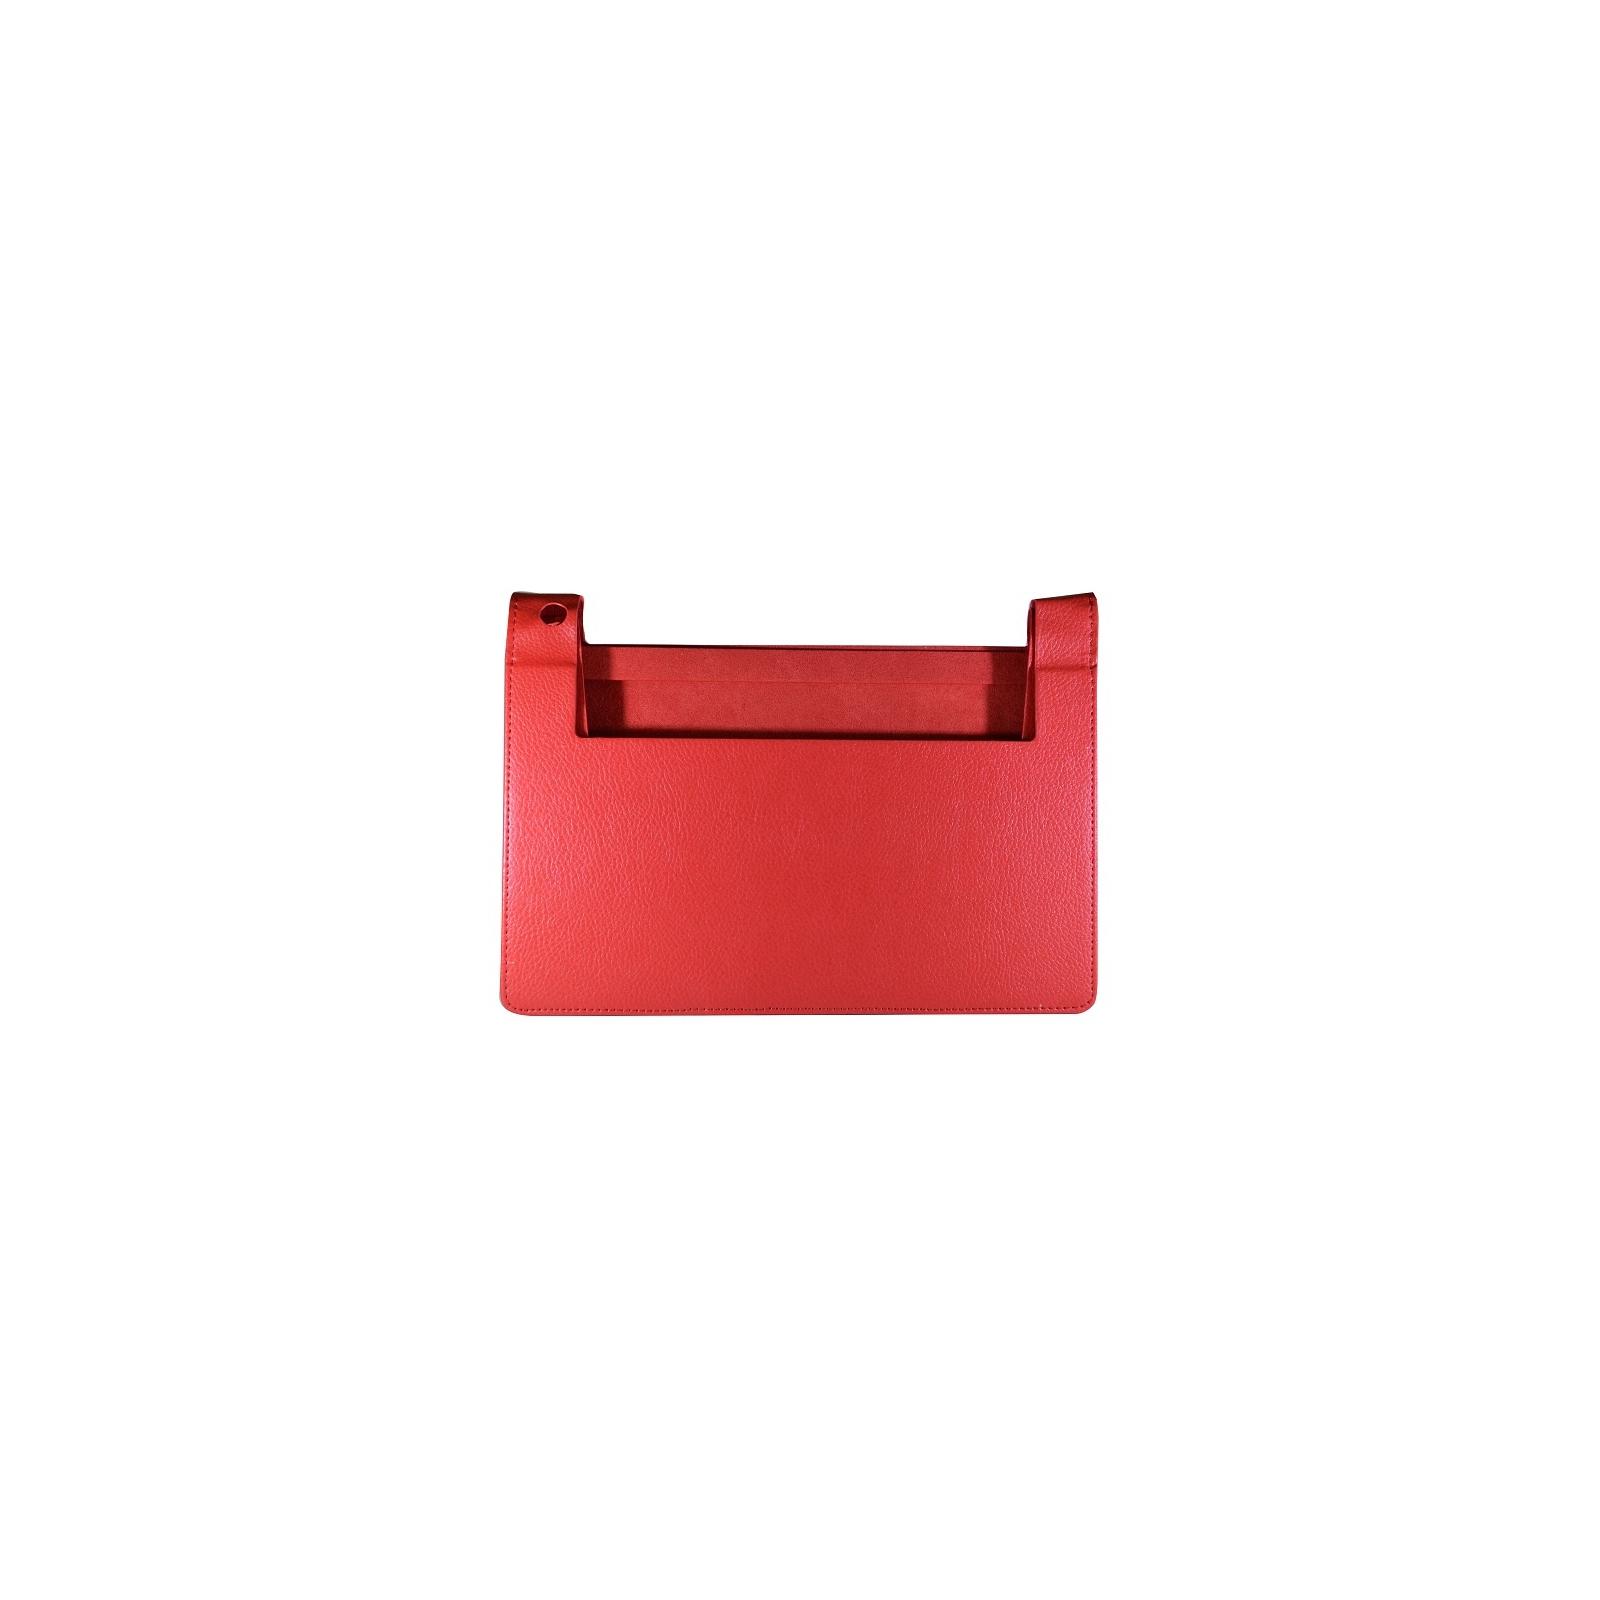 "Чехол для планшета Pro-case 10,1"" Pro-case Lenovo B8080 red (B8080r) изображение 2"